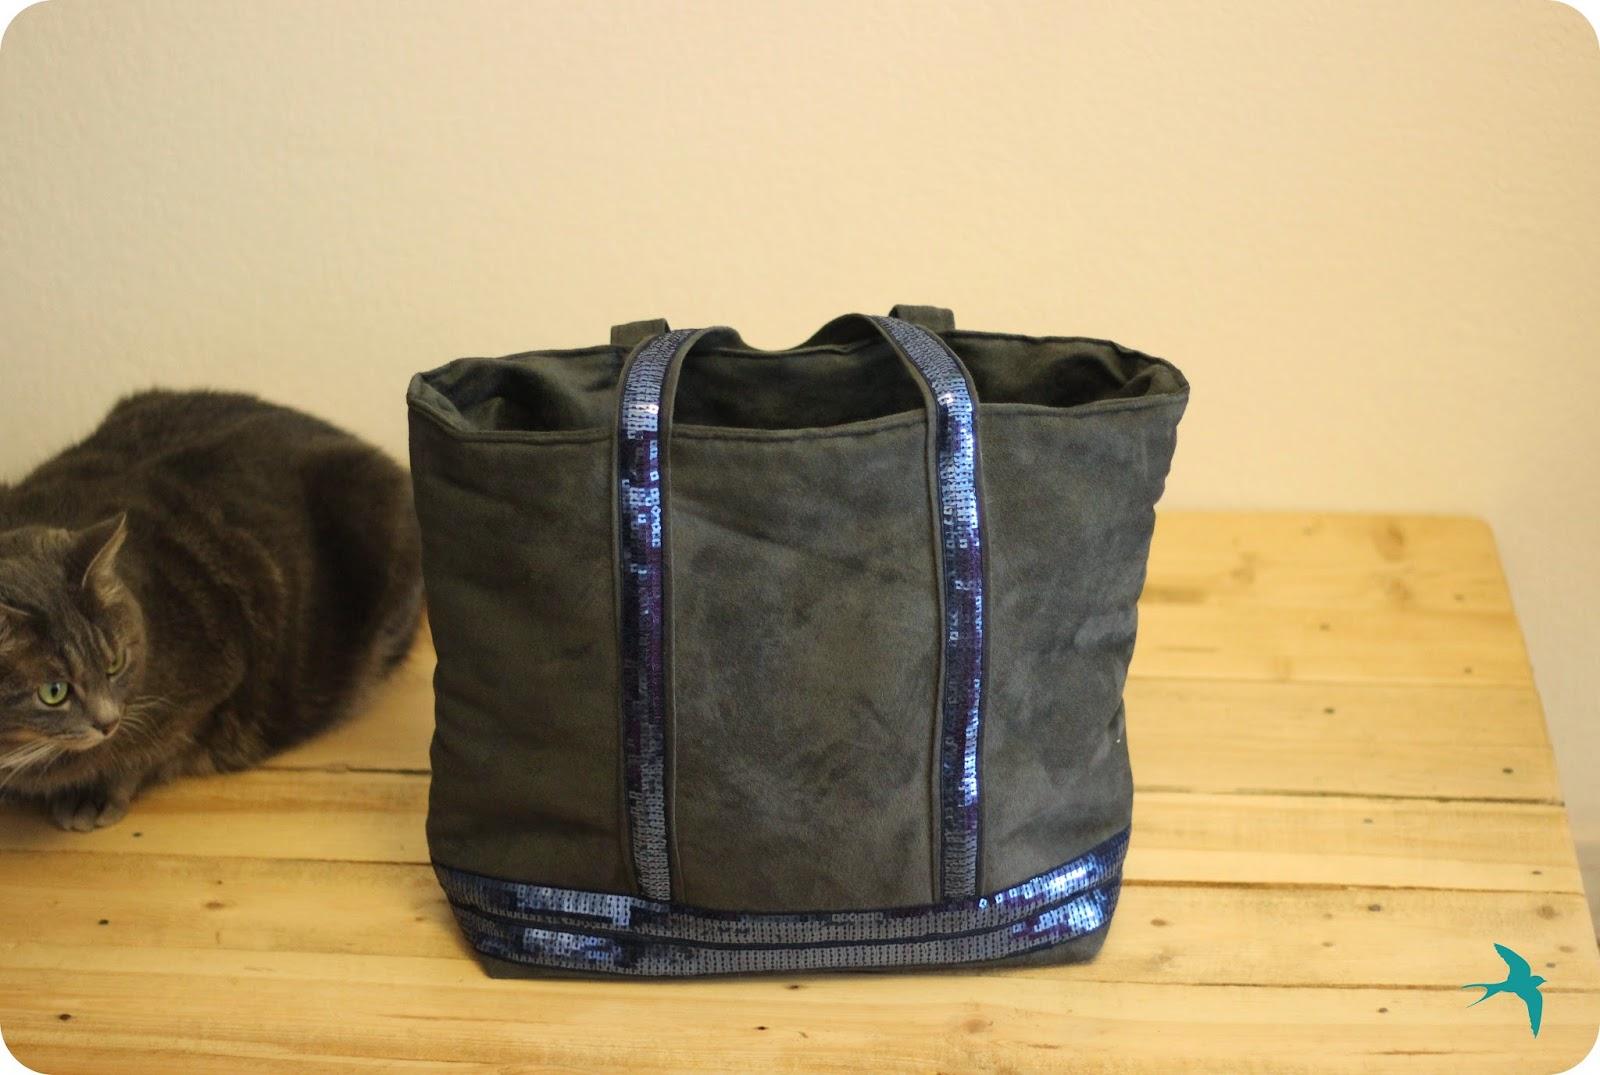 Tuto couture sac vanessa bruno - Tuto grand sac cabas ...